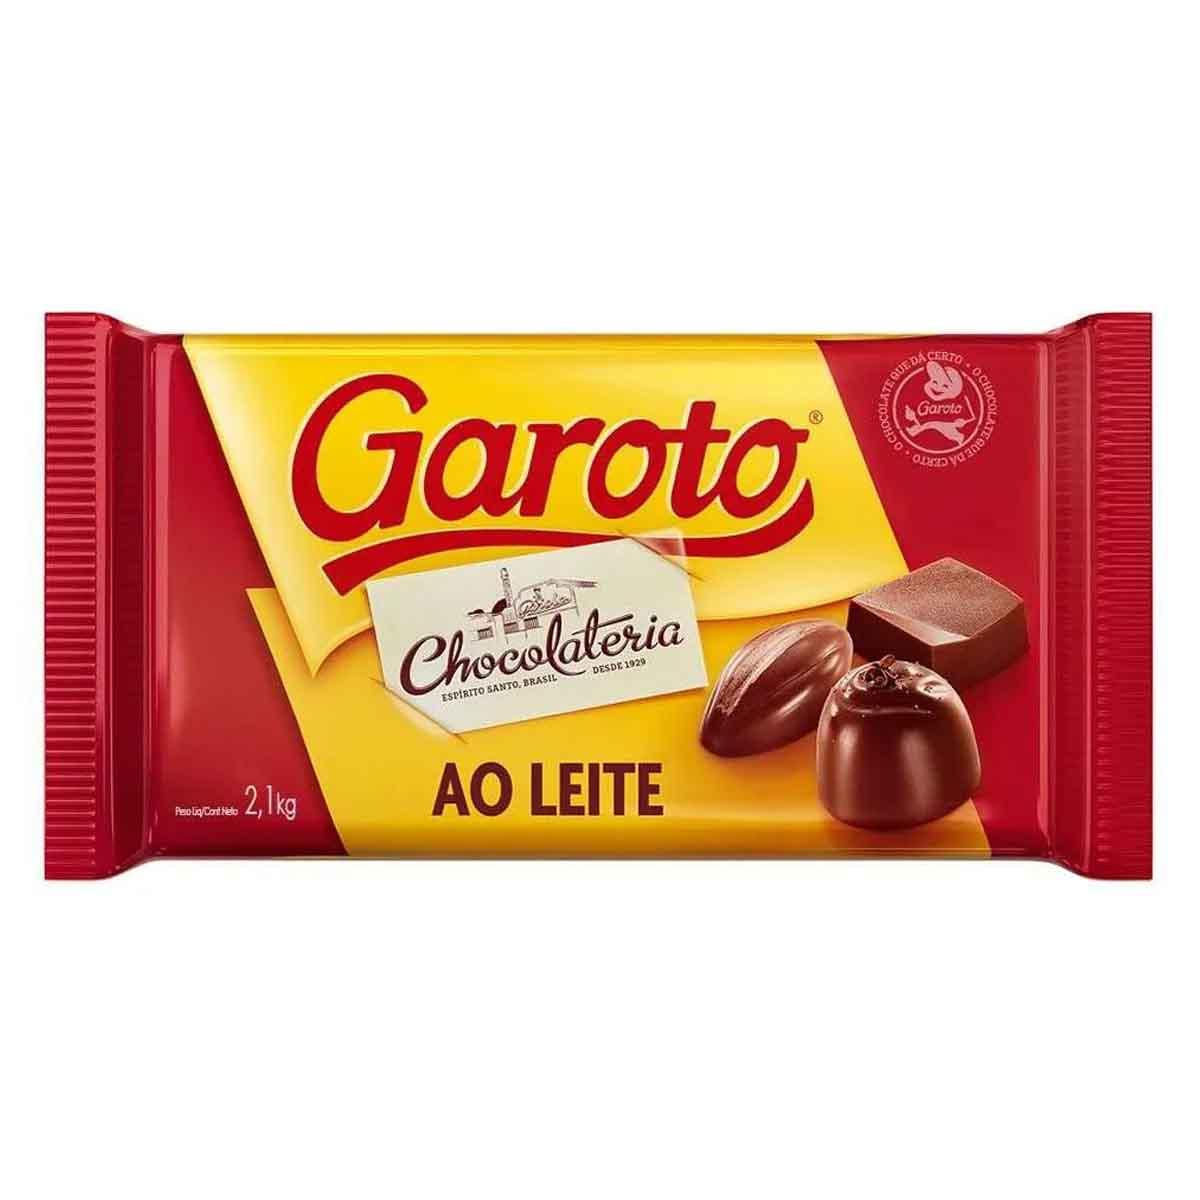 Kit Chocolate Garoto Ao Leite Branco Blend 2.1kg Barra